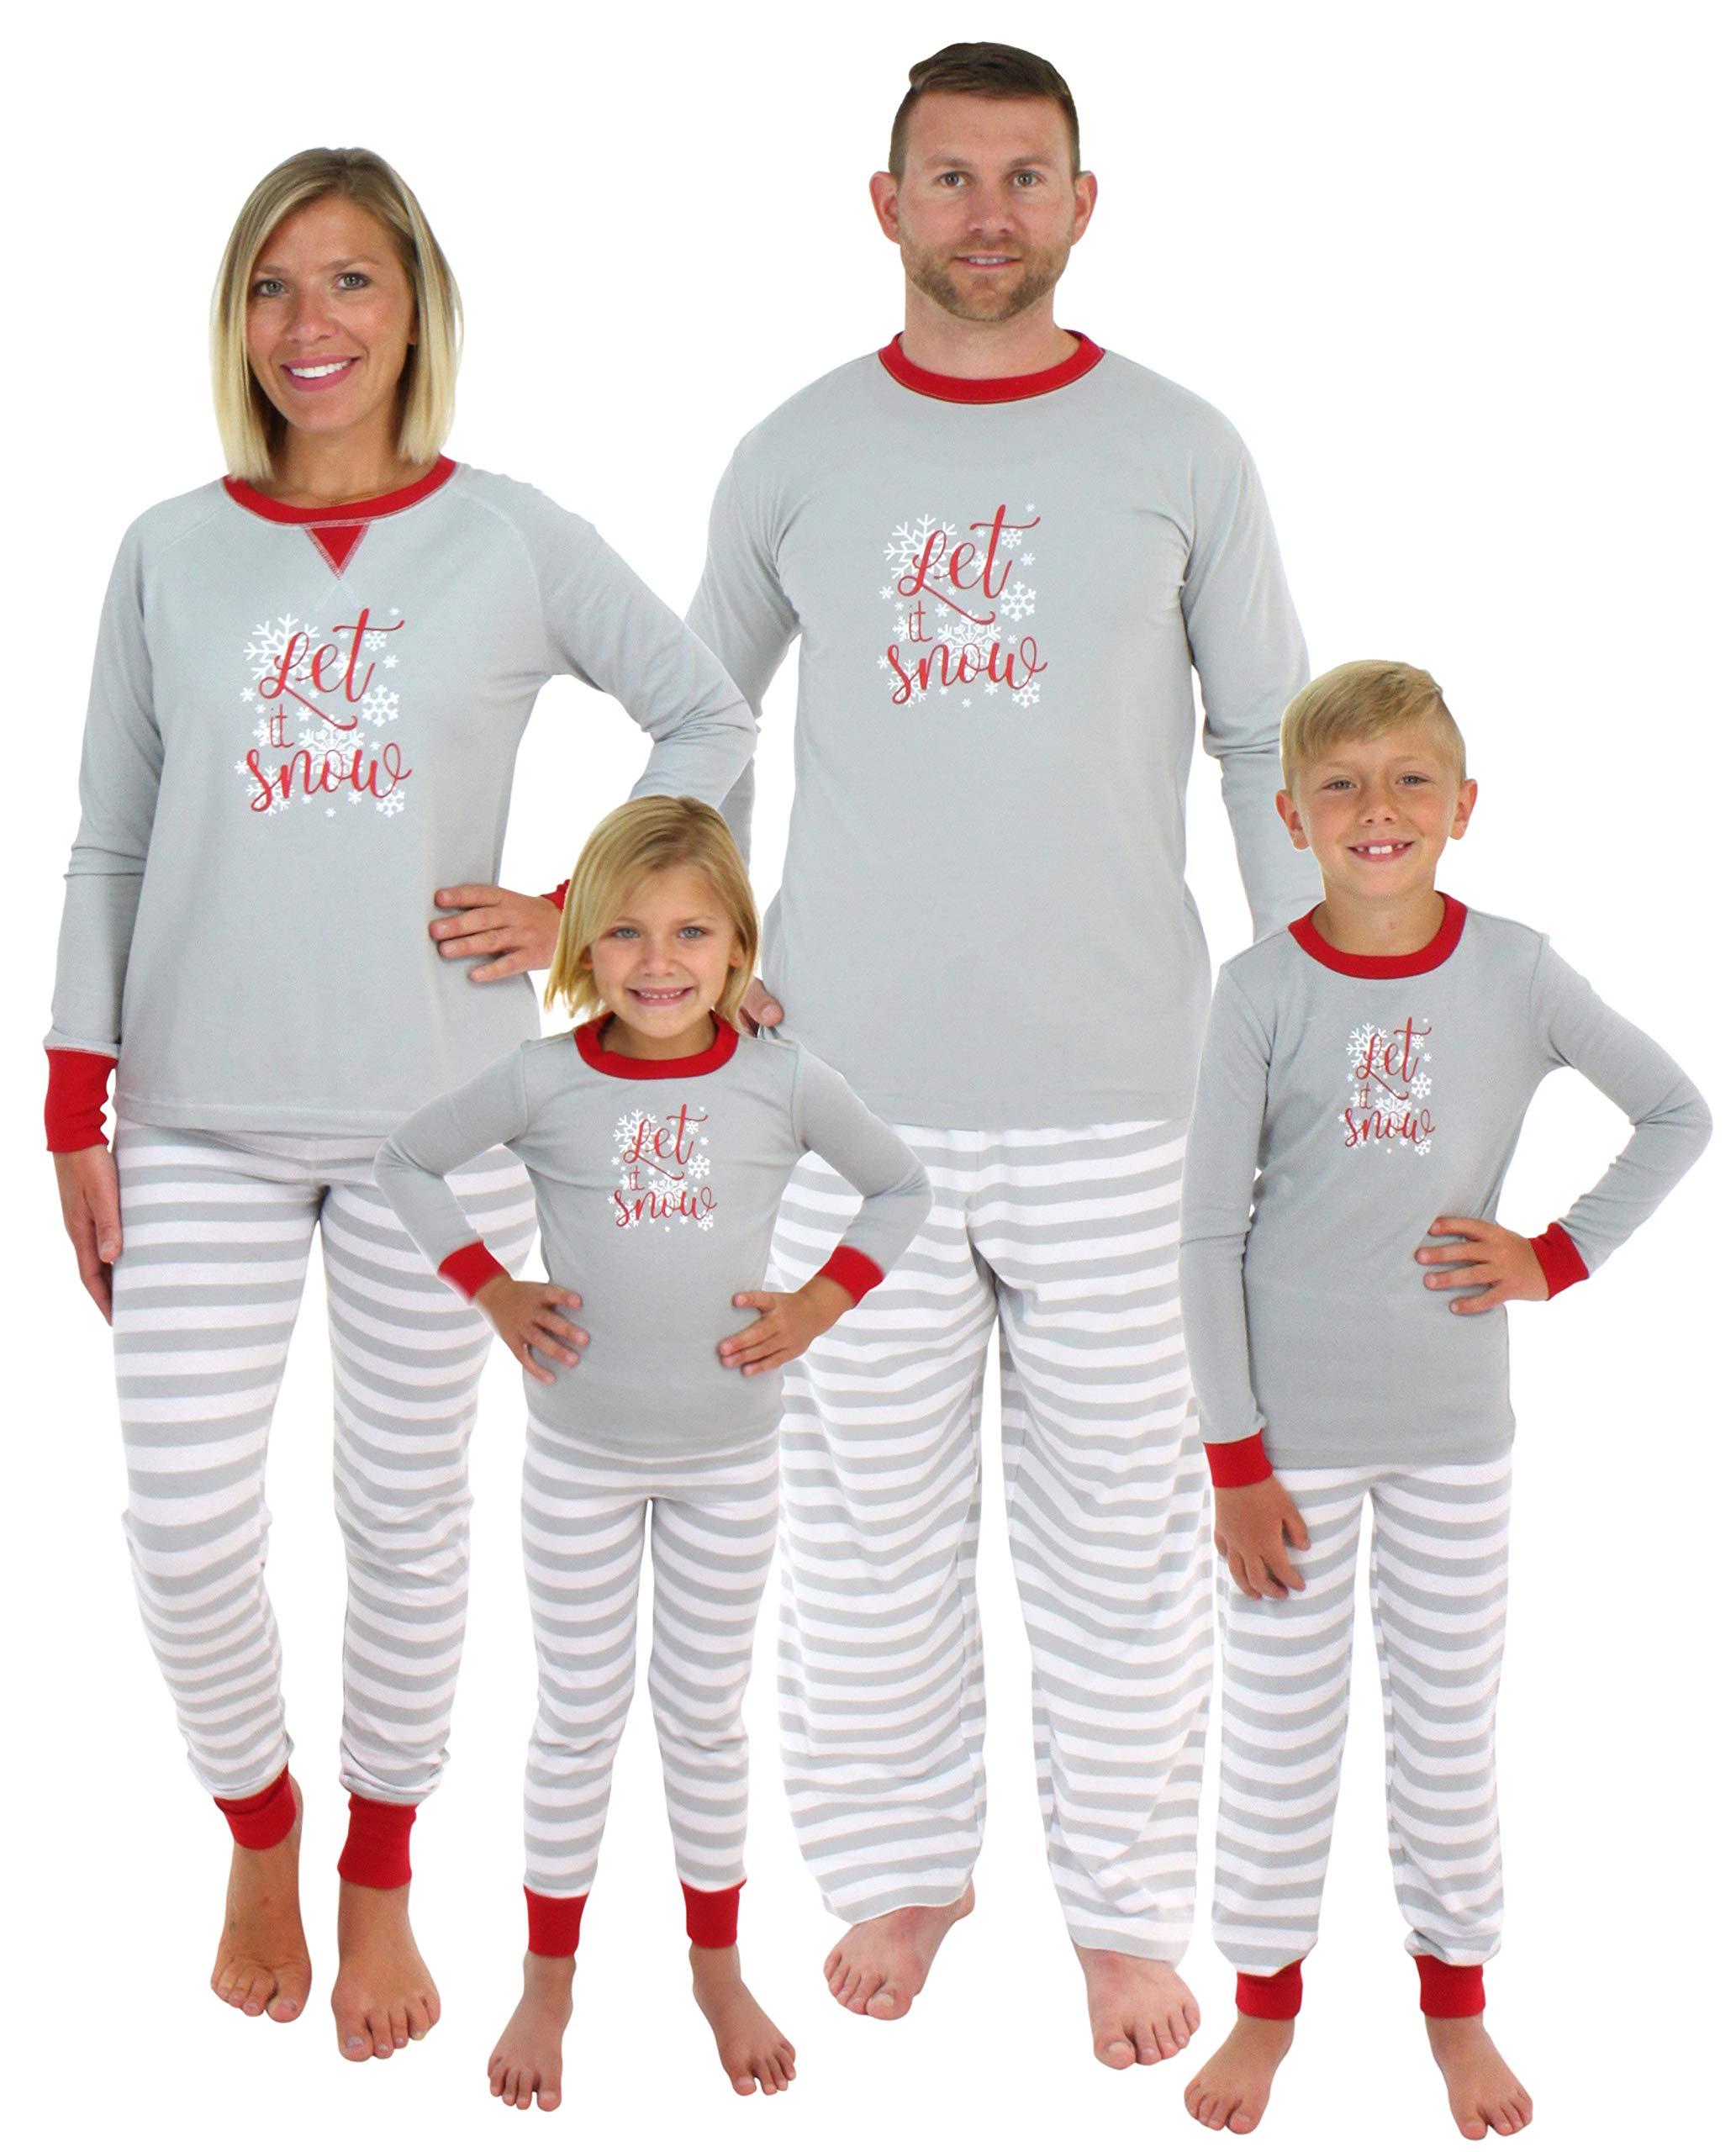 Sleepyheads Holiday Family Matching Winter Snowflake Pajama PJ Sets ... 6843f8ca3